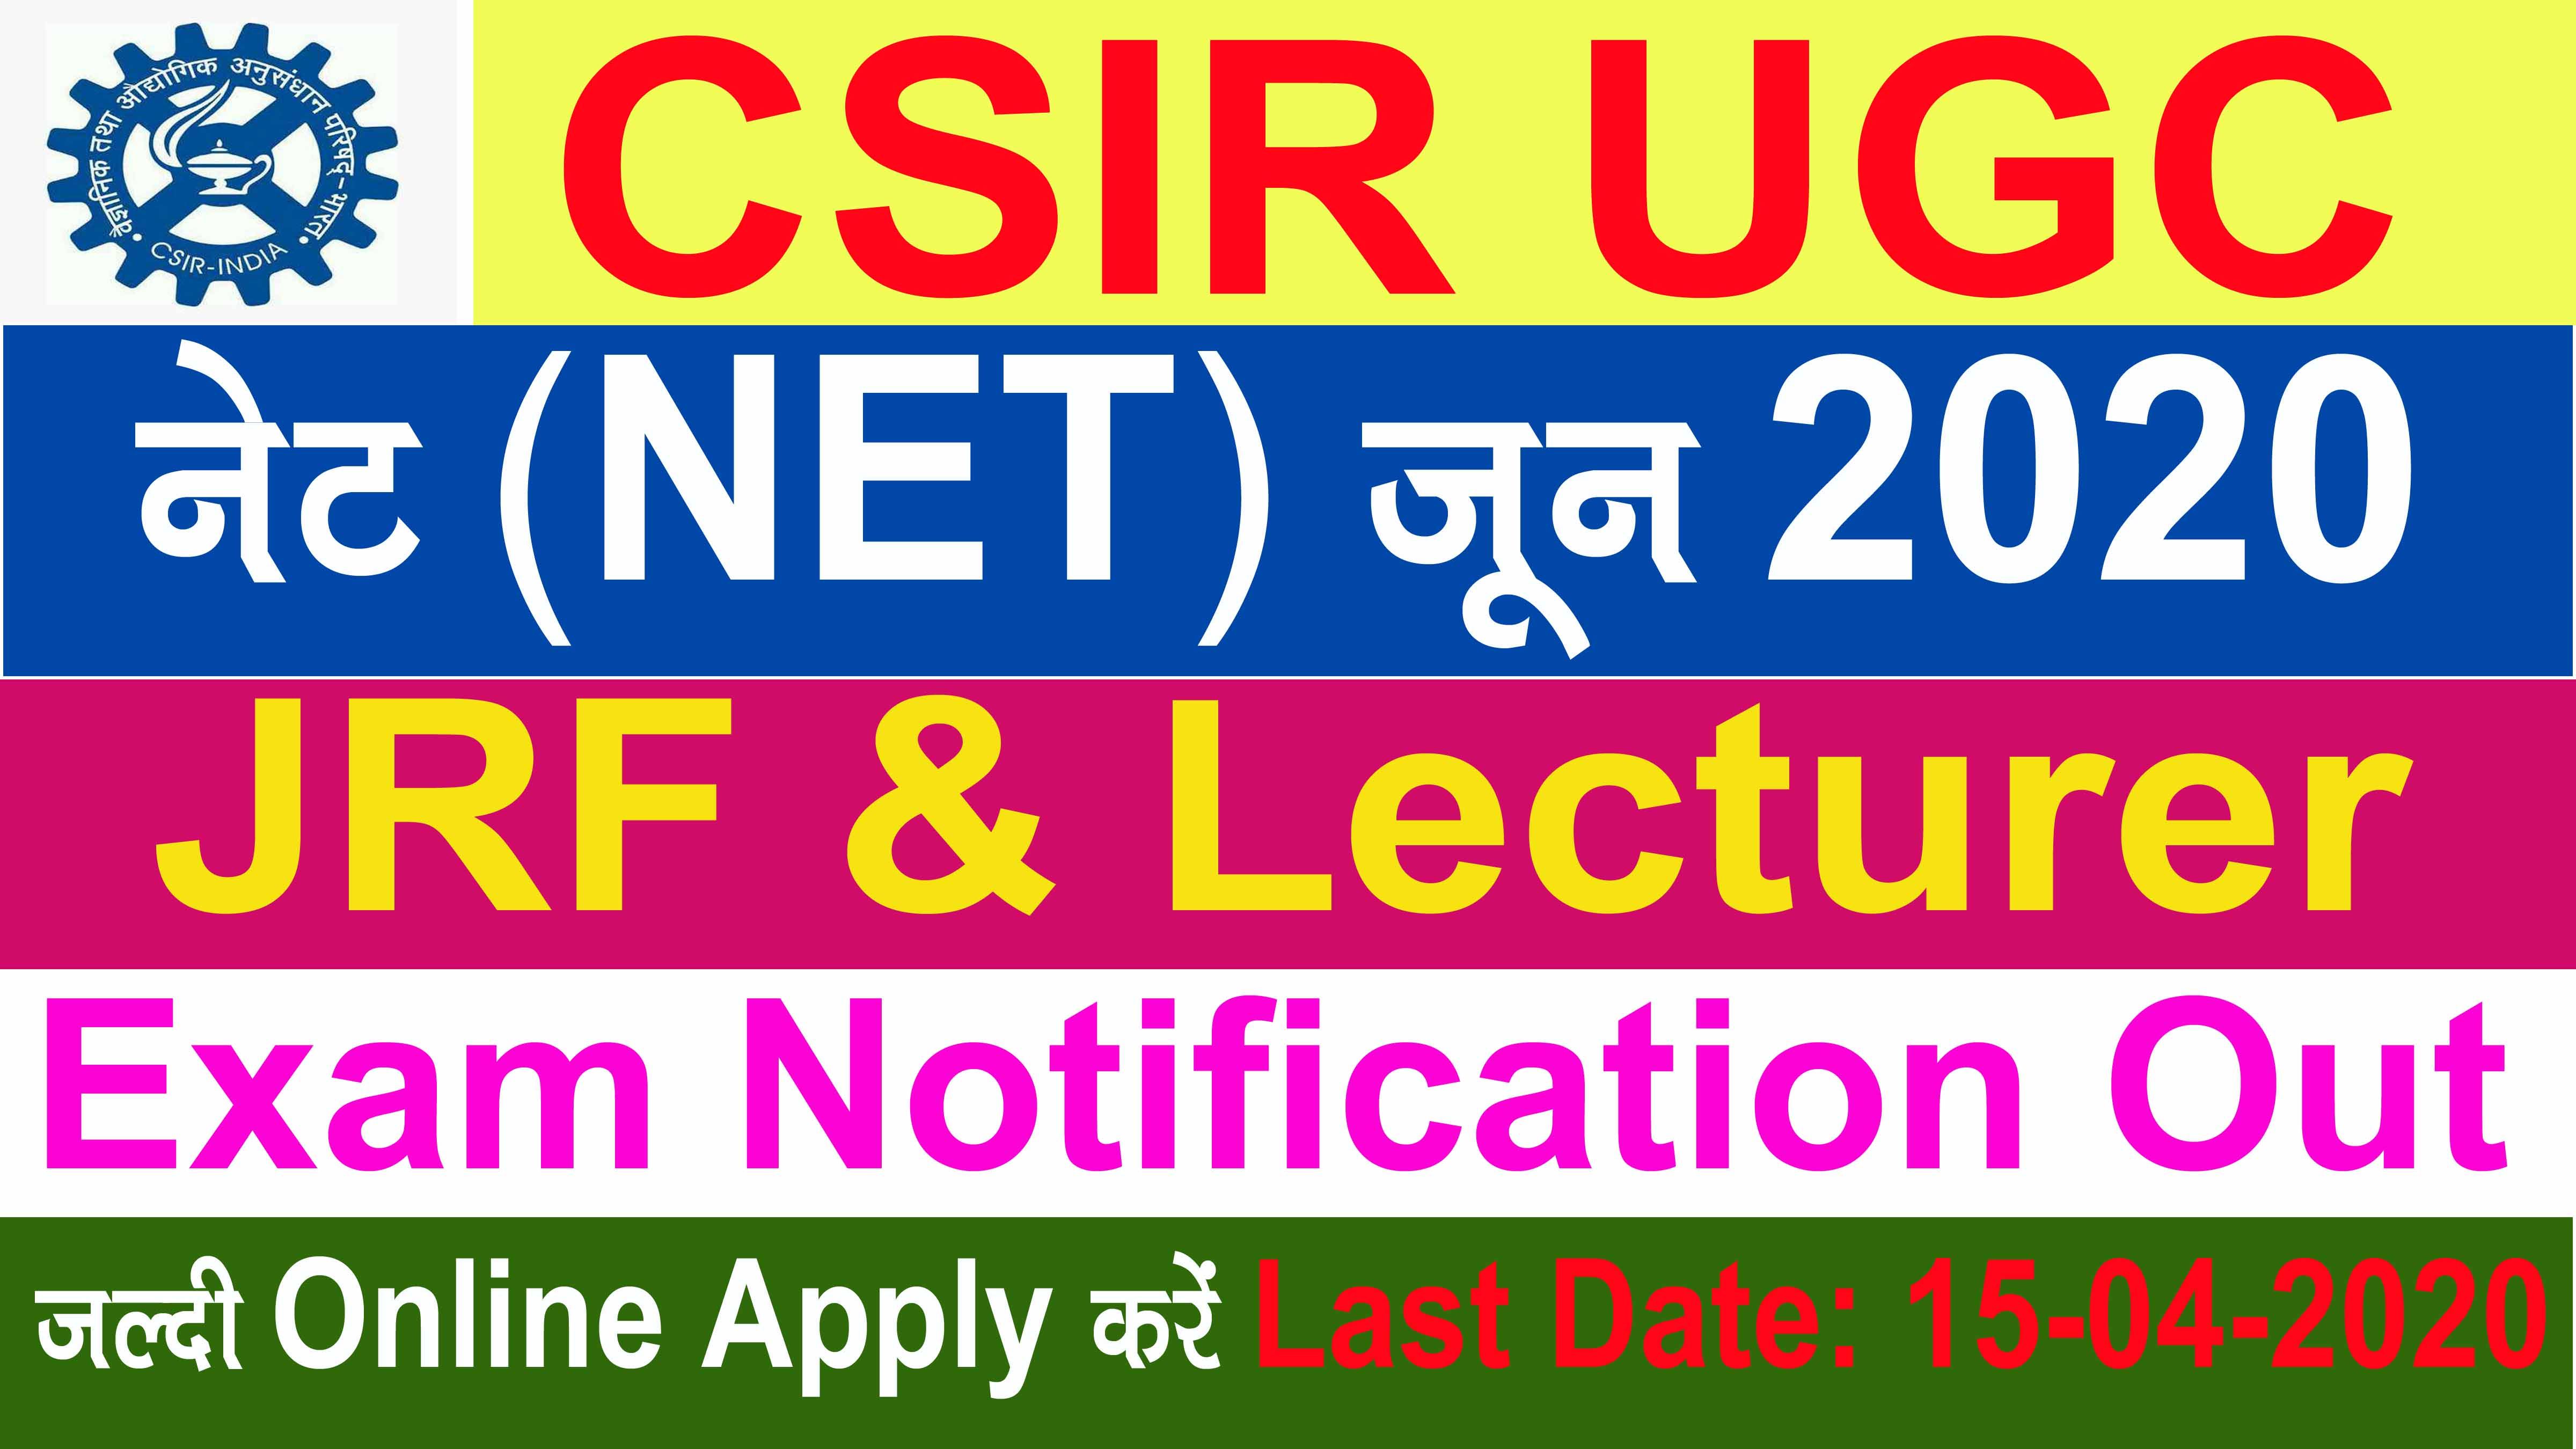 CSIR UGC NET 2020 Apply Online